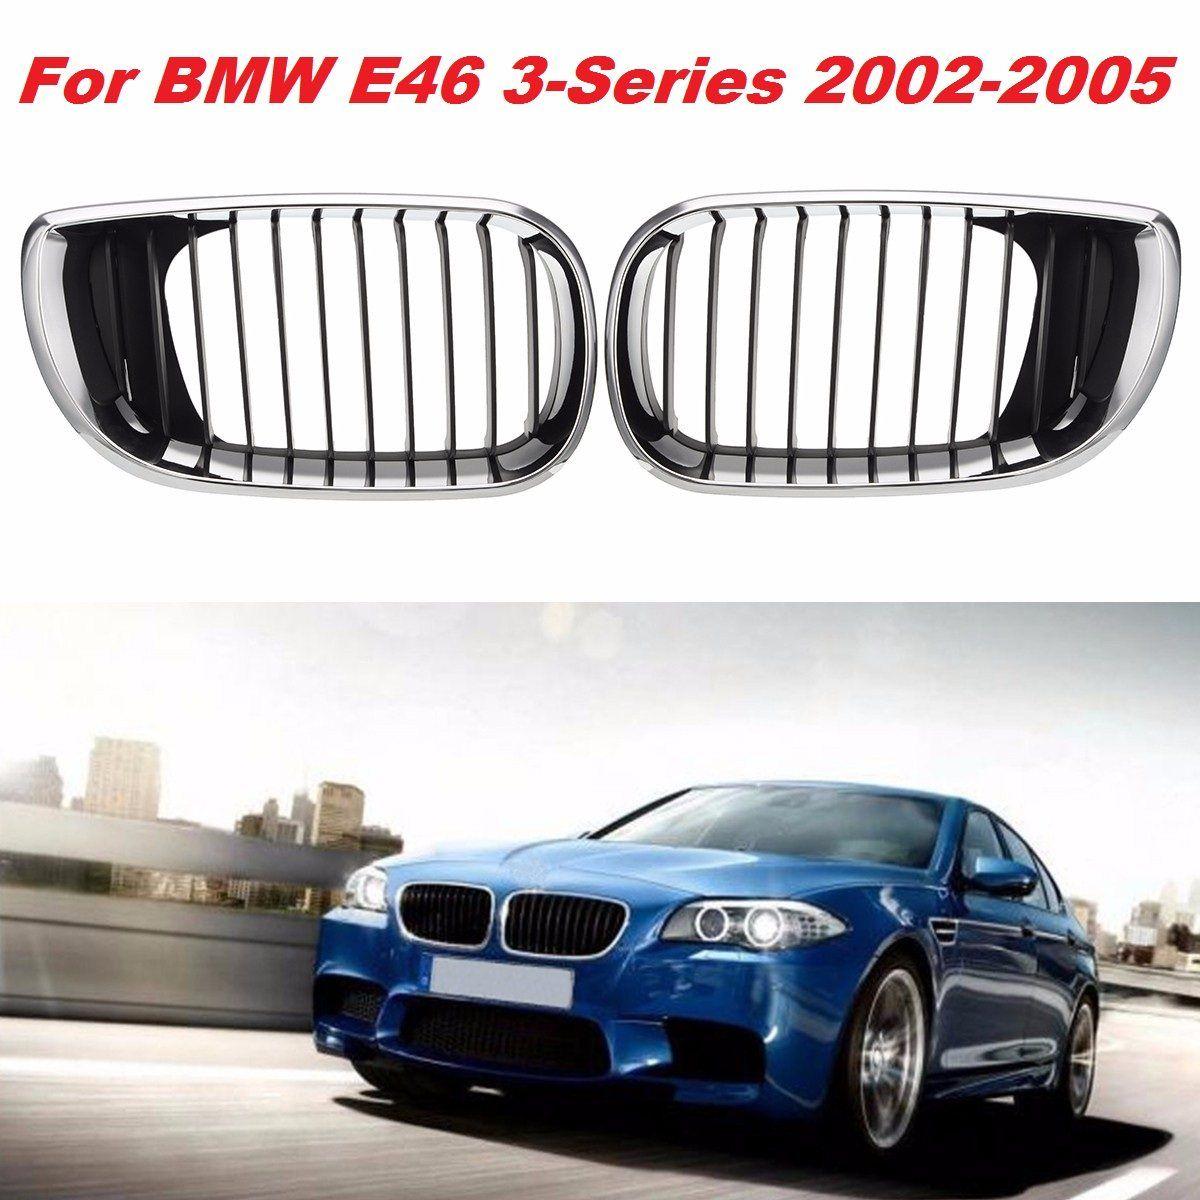 2Pcs L+R Chrome Car Front Kidney Grille Grill For BMW E46 3 Series 4-Door Saloon Estate 2001 2002 2003 2004 2005 #51137030546